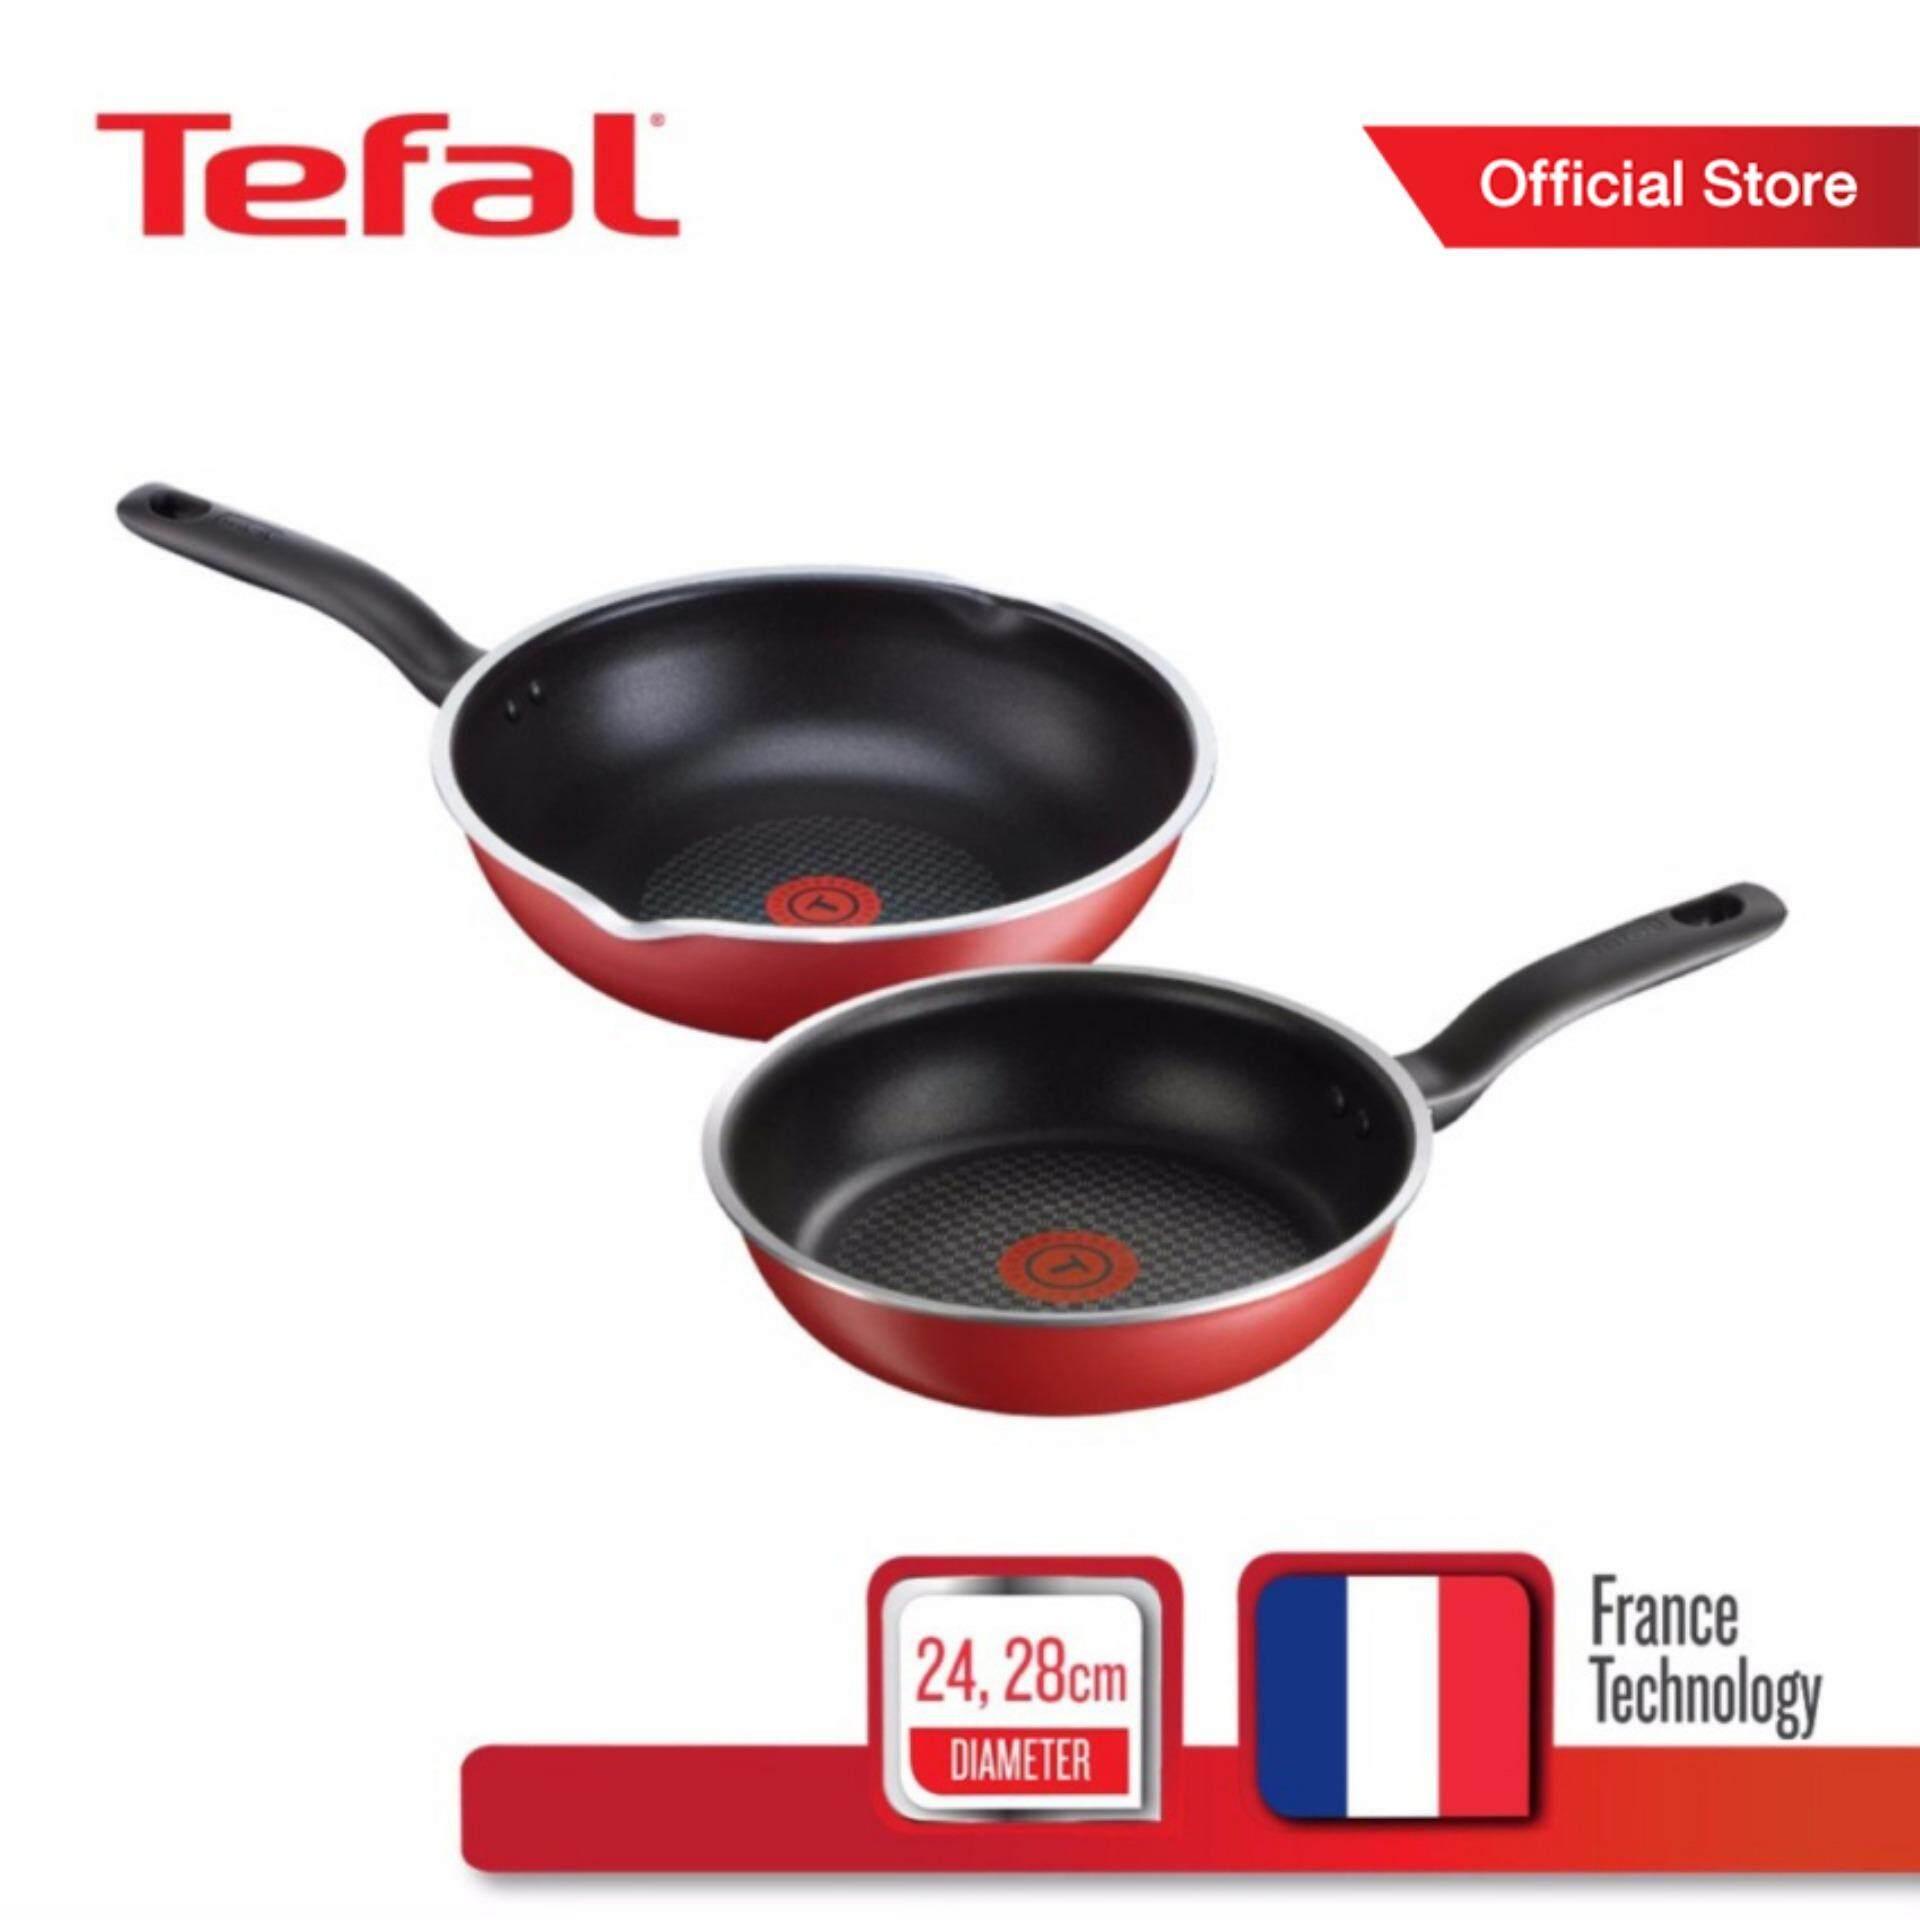 Tefal1482 ค้นพบสินค้าใน Tefalเรียงตาม:ความเป็นที่นิยมจำนวนคนดู: